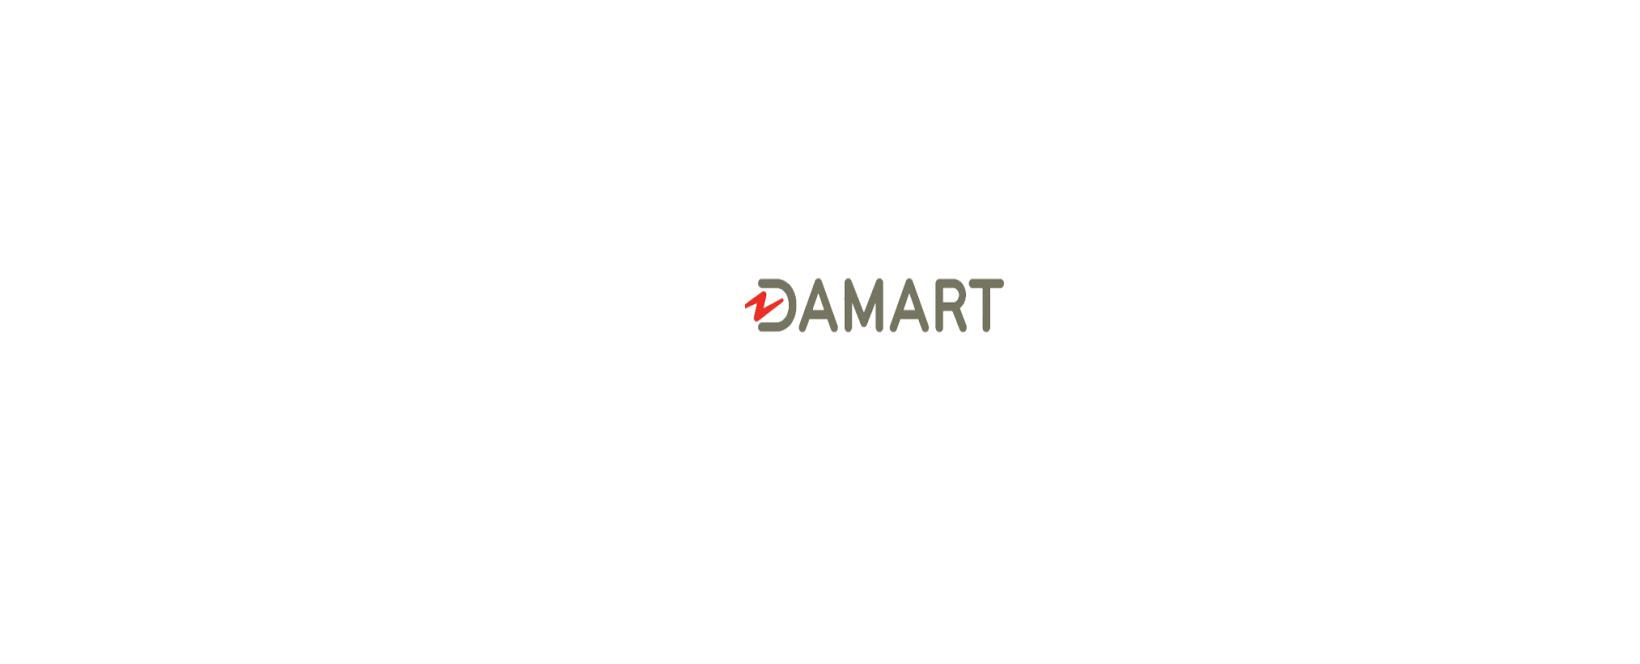 Damart UK Discount Code 2021